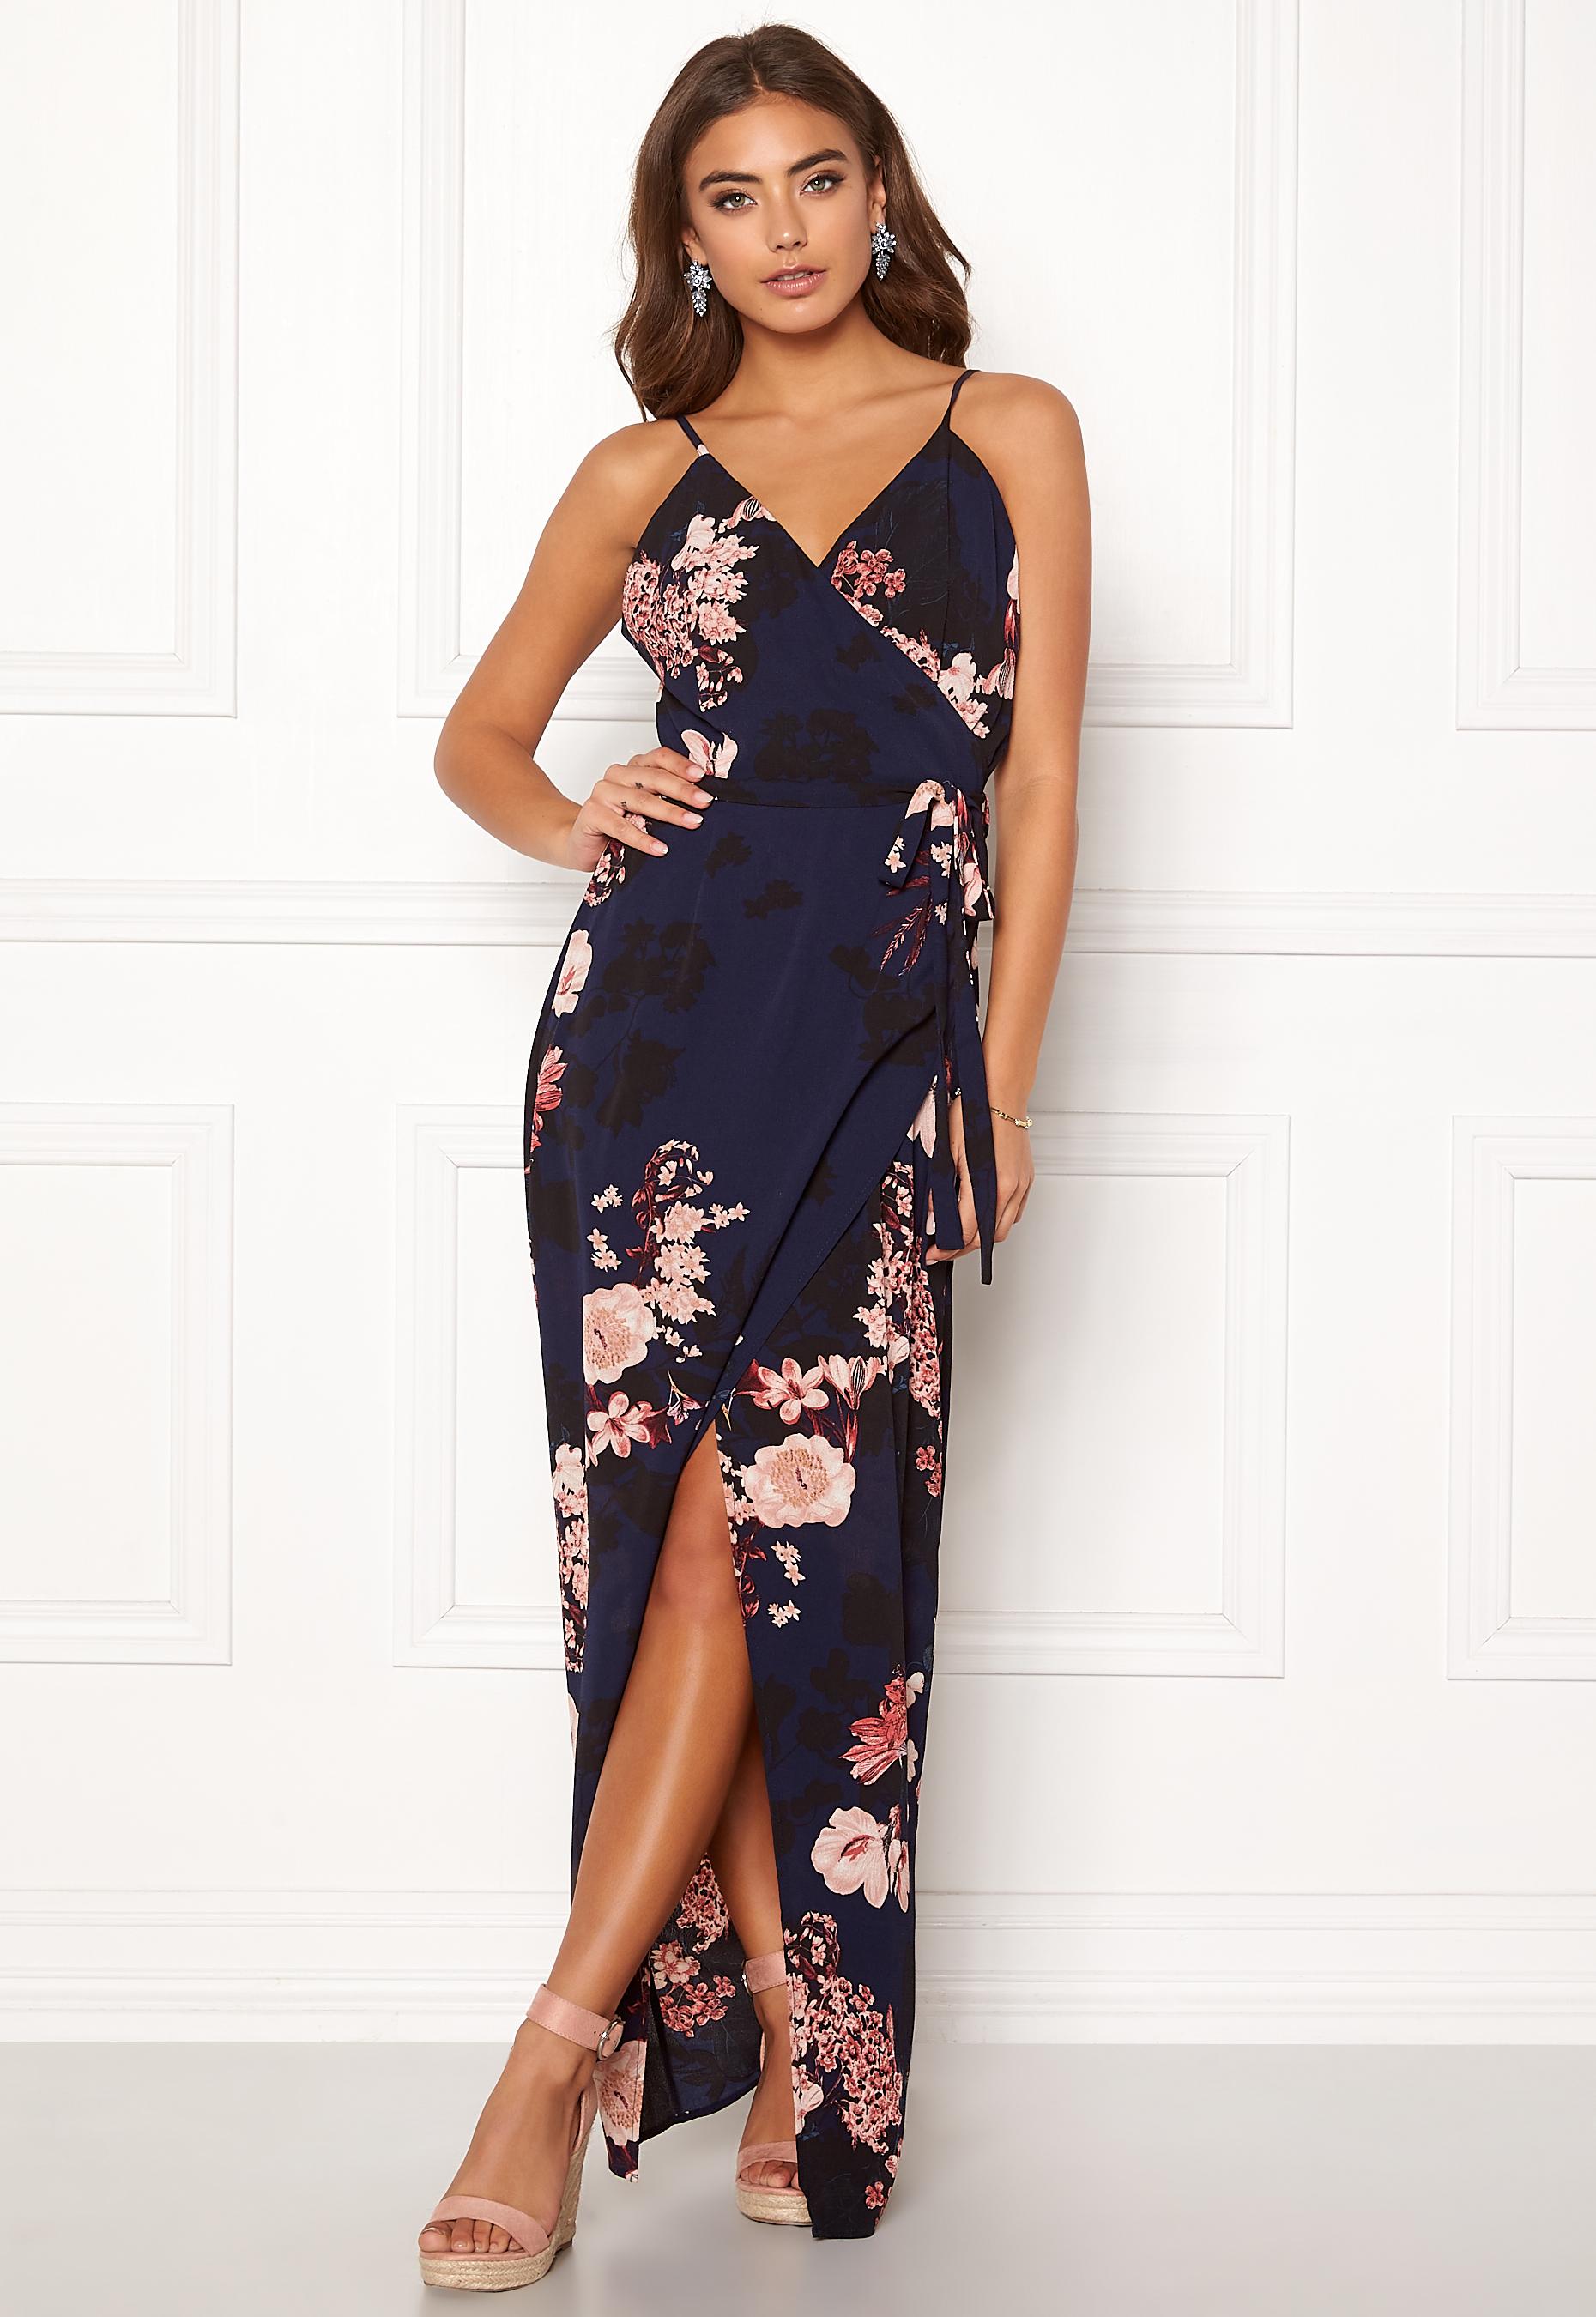 499504cad29 Girl In Mind Mia Wrap Maxi Dress Navy - Bubbleroom